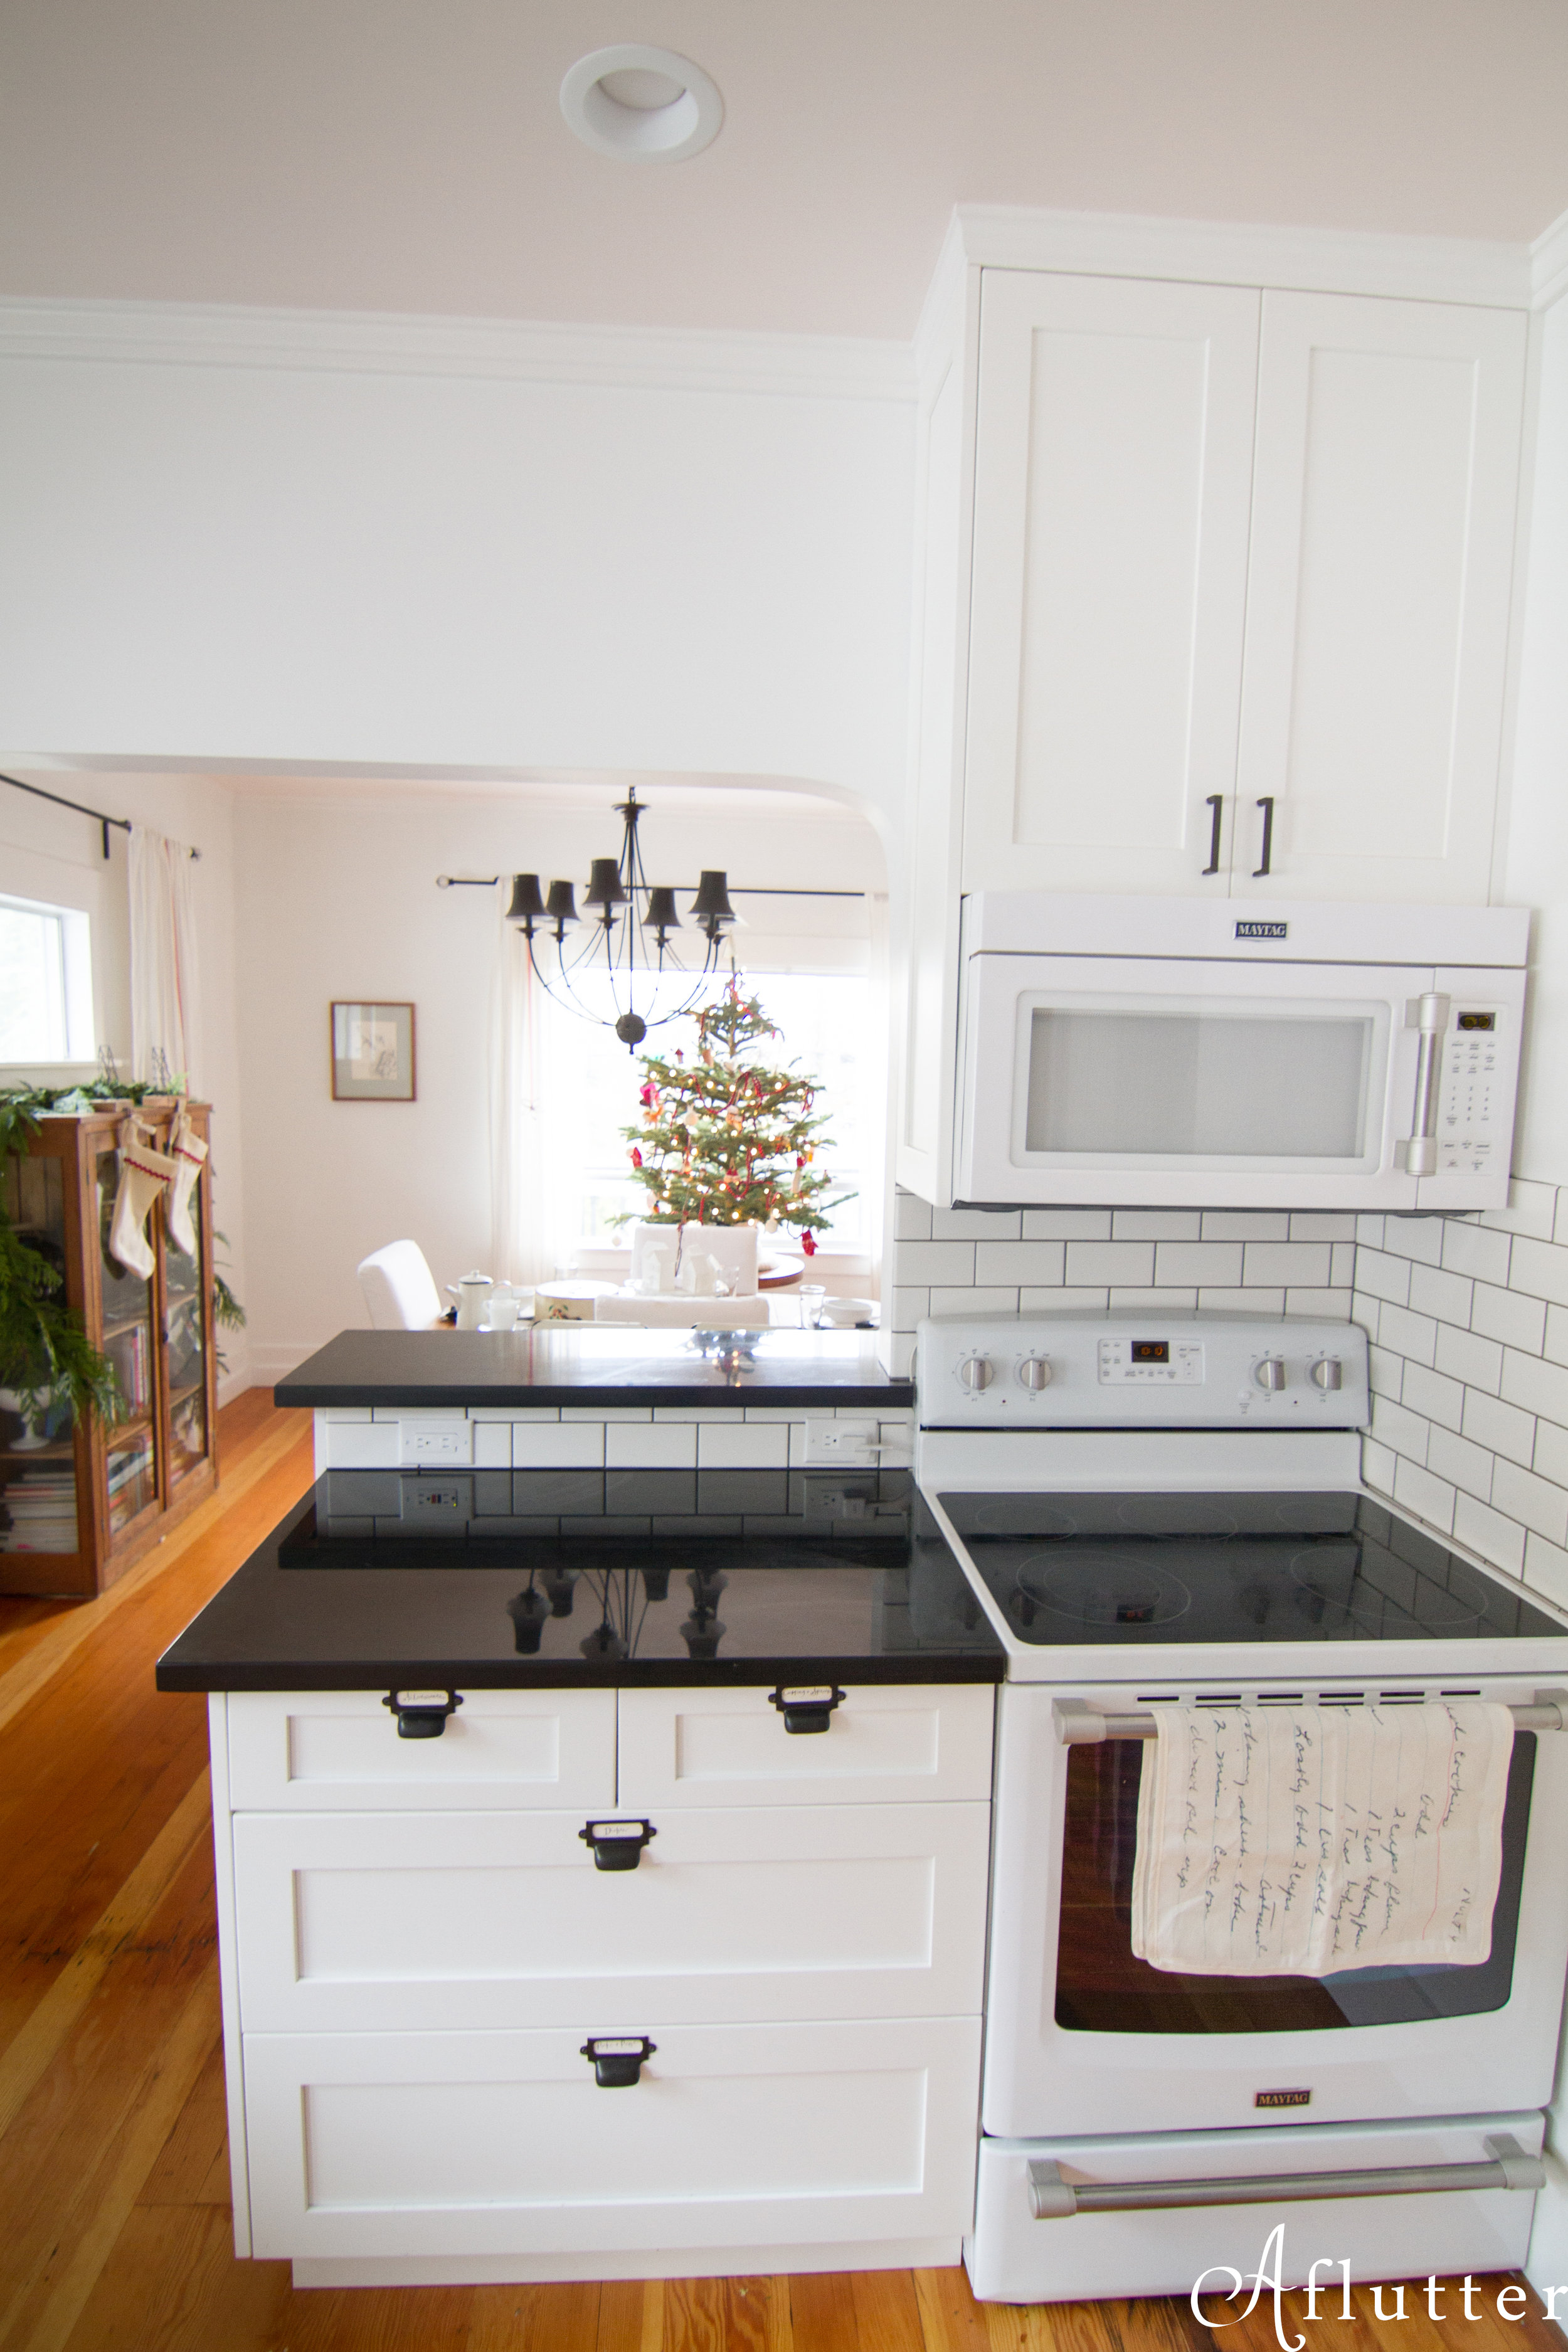 Christmas-Kitchen-Reveal-18-of-20.jpg